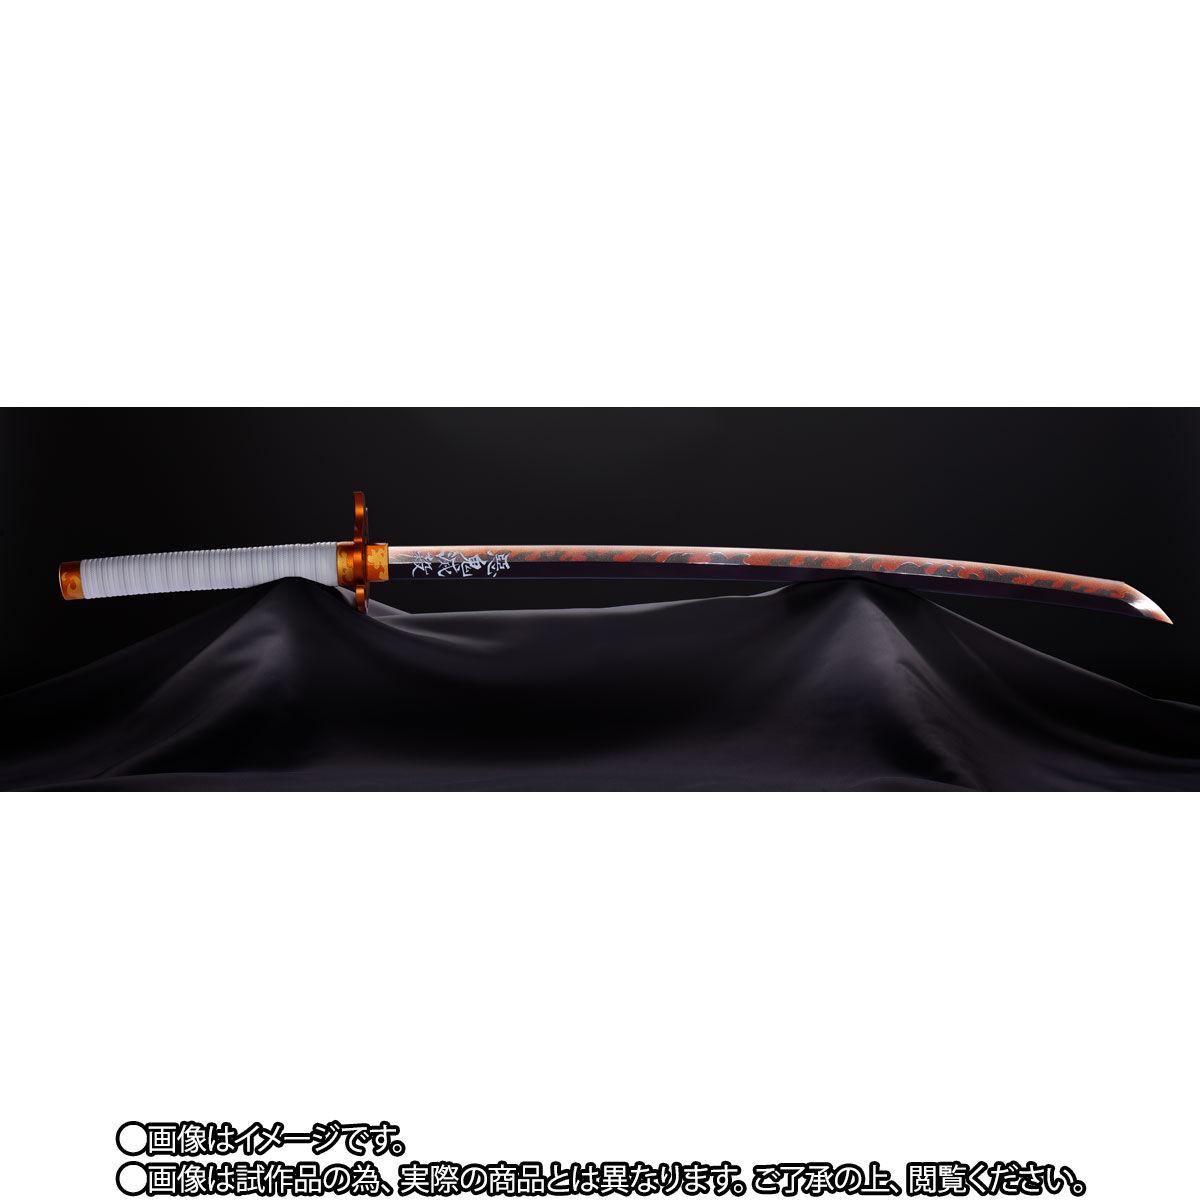 PROPLICA プロップリカ『日輪刀(煉獄杏寿郎)』鬼滅の刃 変身なりきり-004